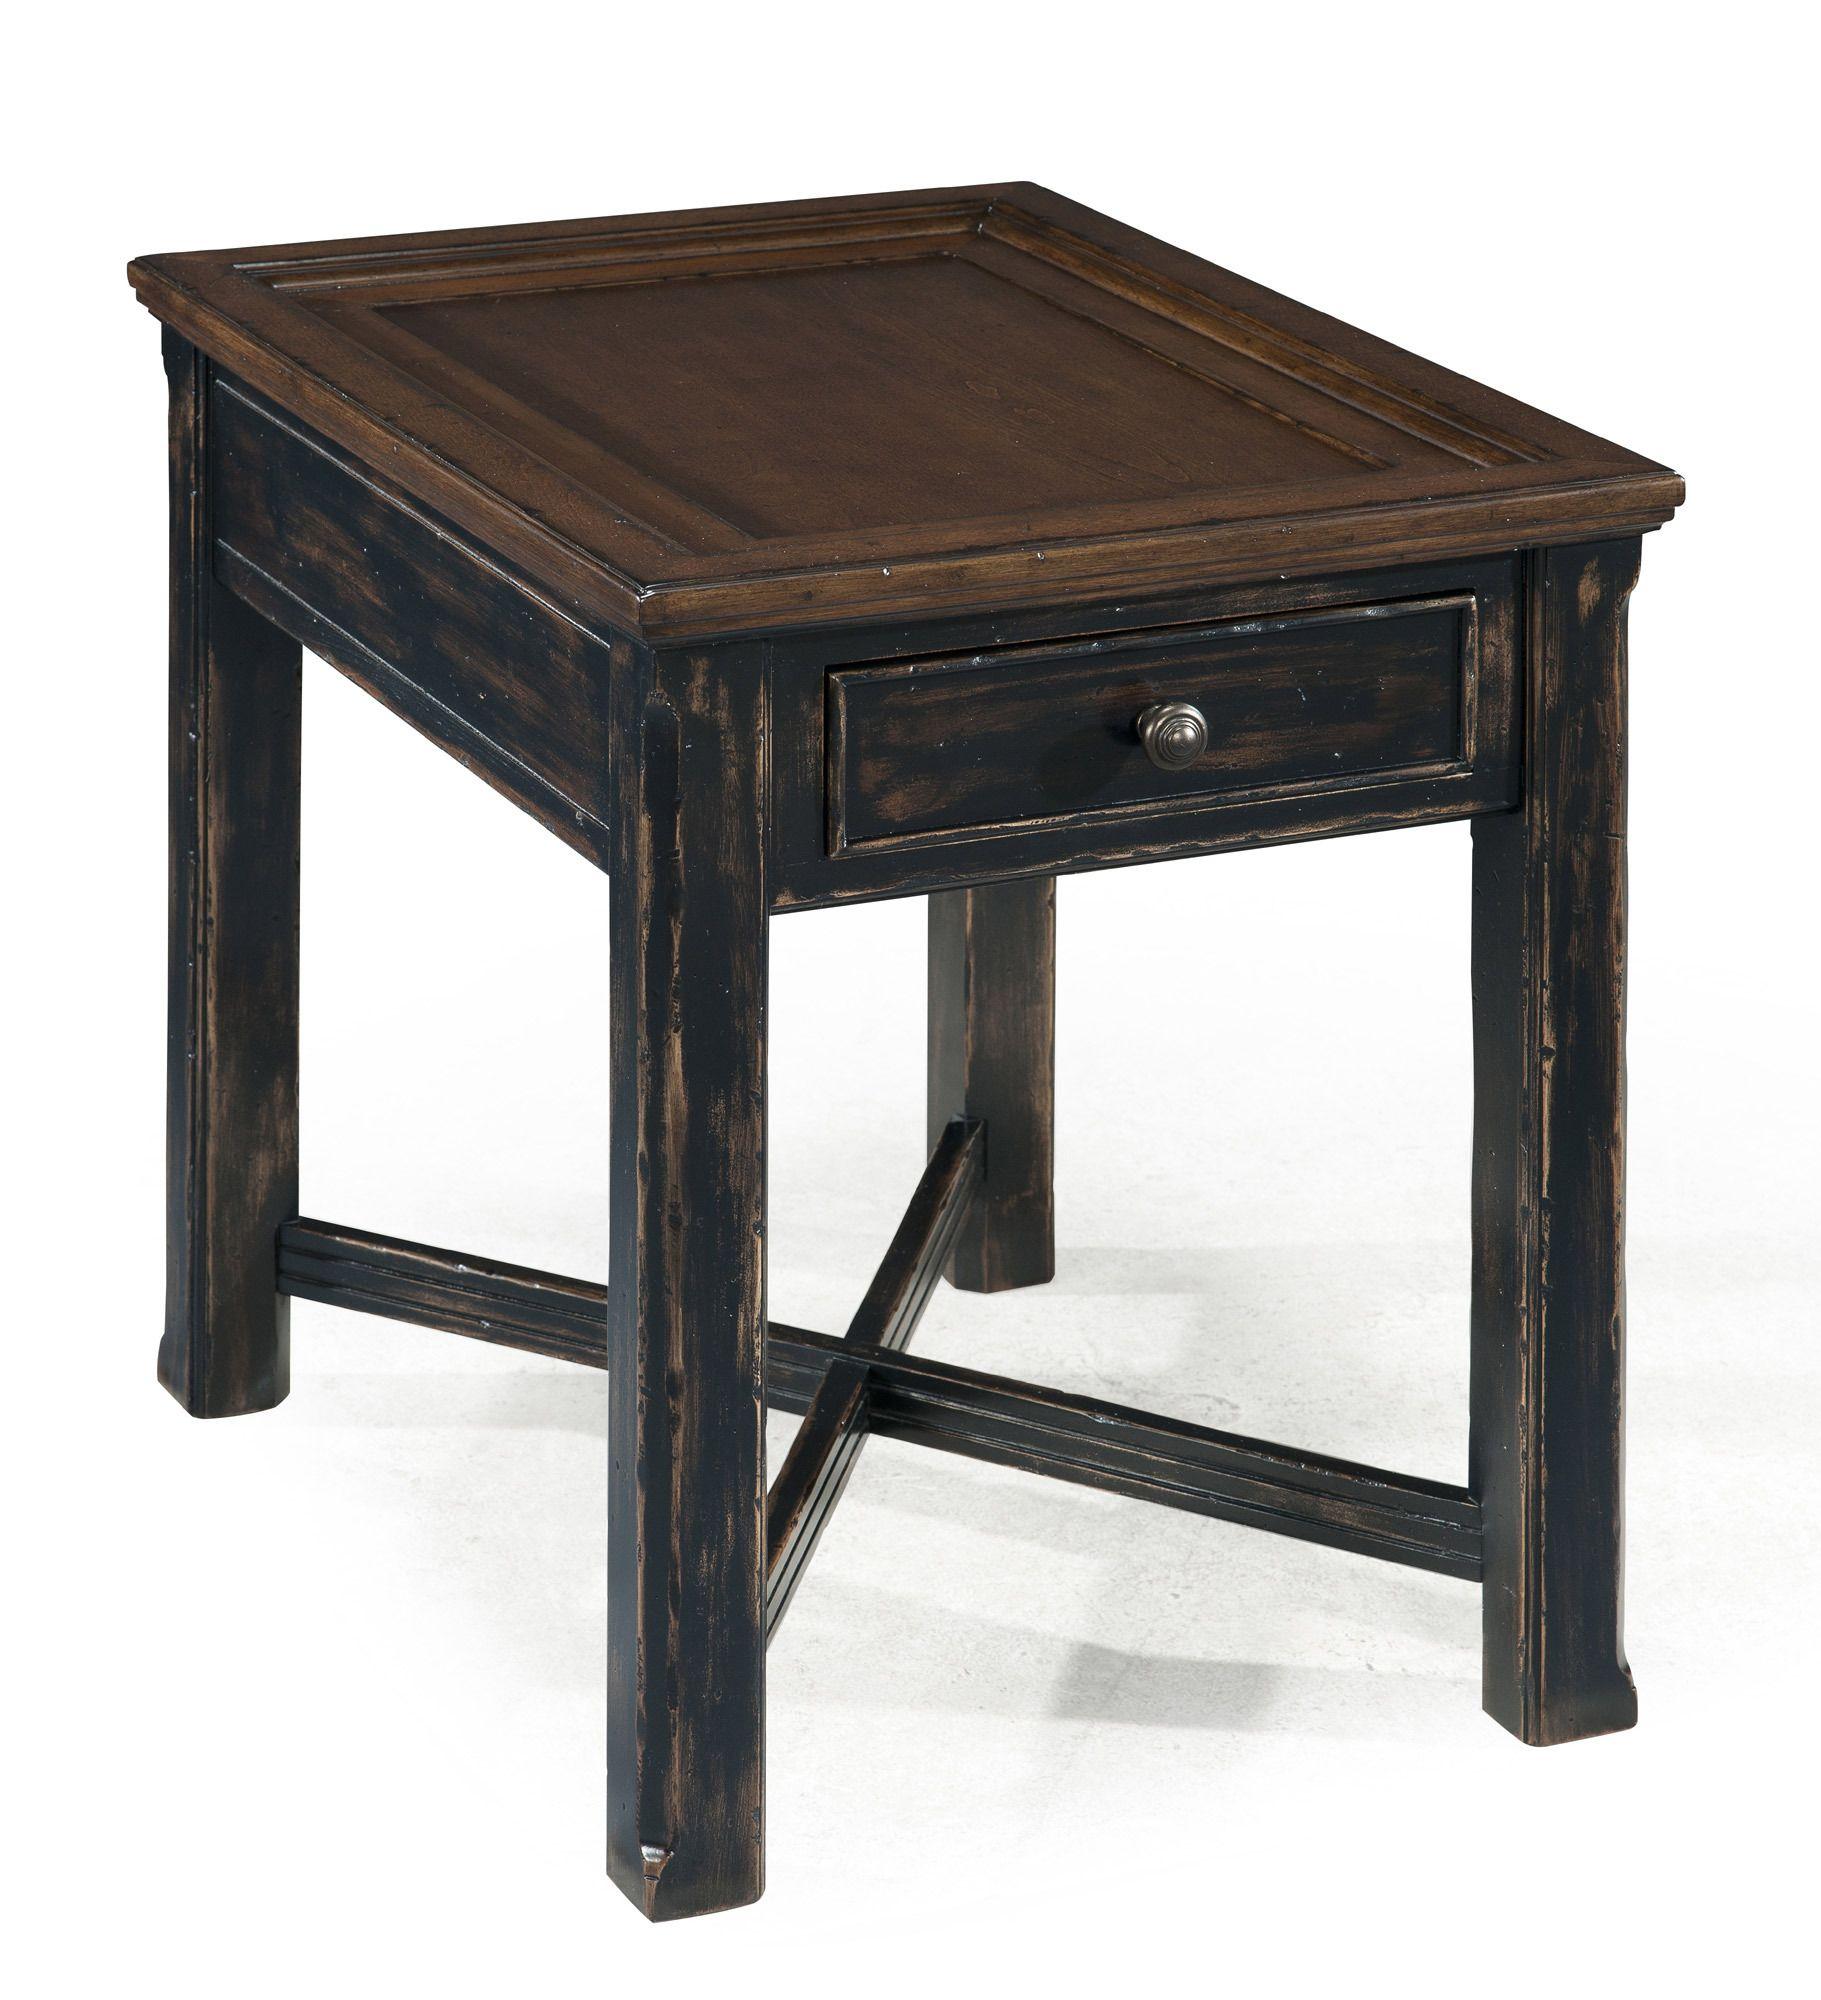 Clanton rectangular end table magnussen furniture home